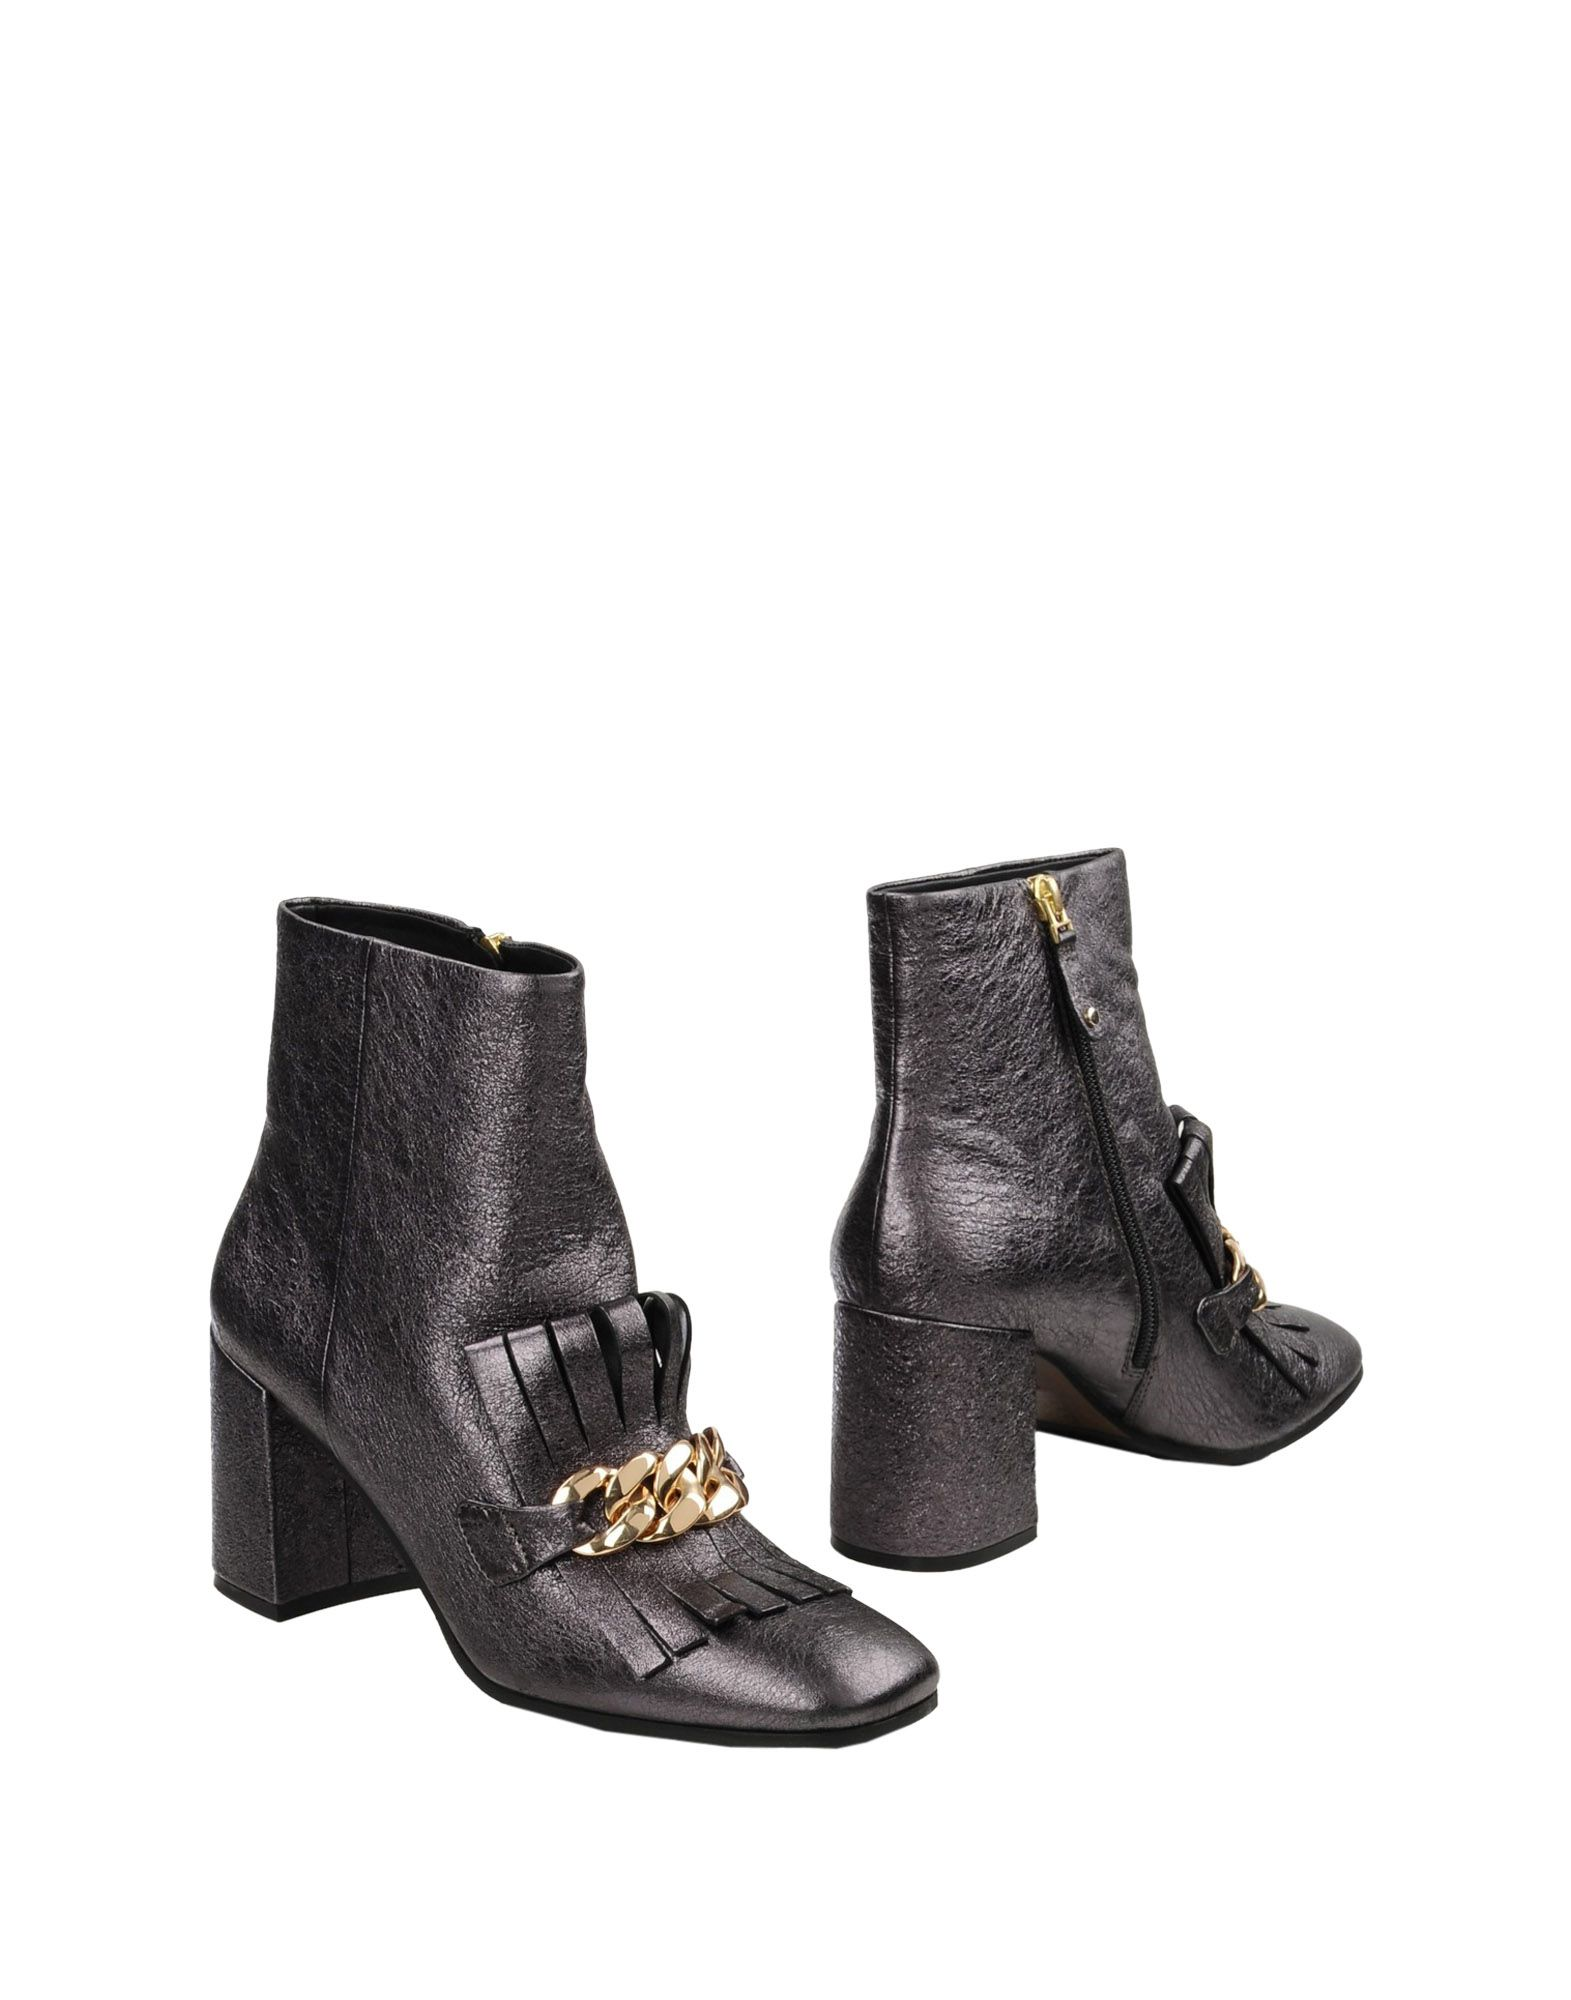 ELVIO ZANON Полусапоги и высокие ботинки elvio zanon полусапоги и высокие ботинки